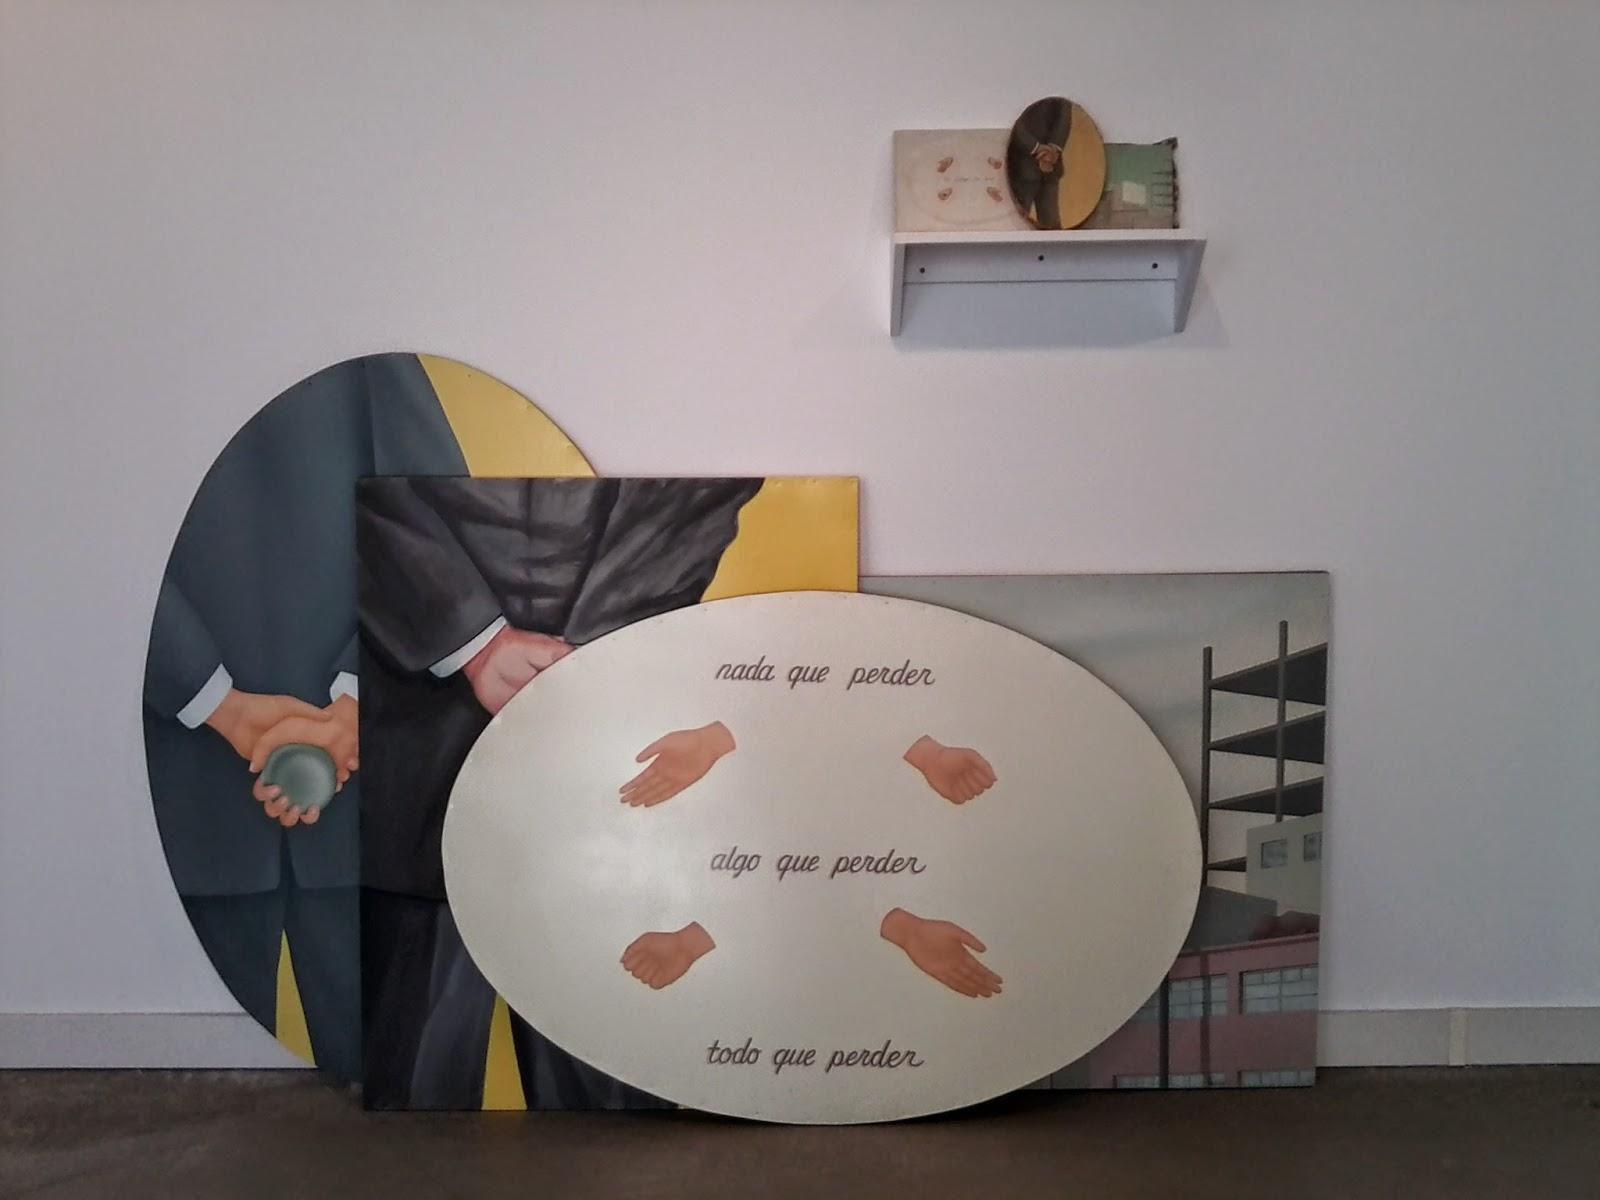 Francis Alÿs, Variation, Blog de arte, Centro de arte alcobendas, Arte contemporáneo, Exposiciones temporales, Madrid